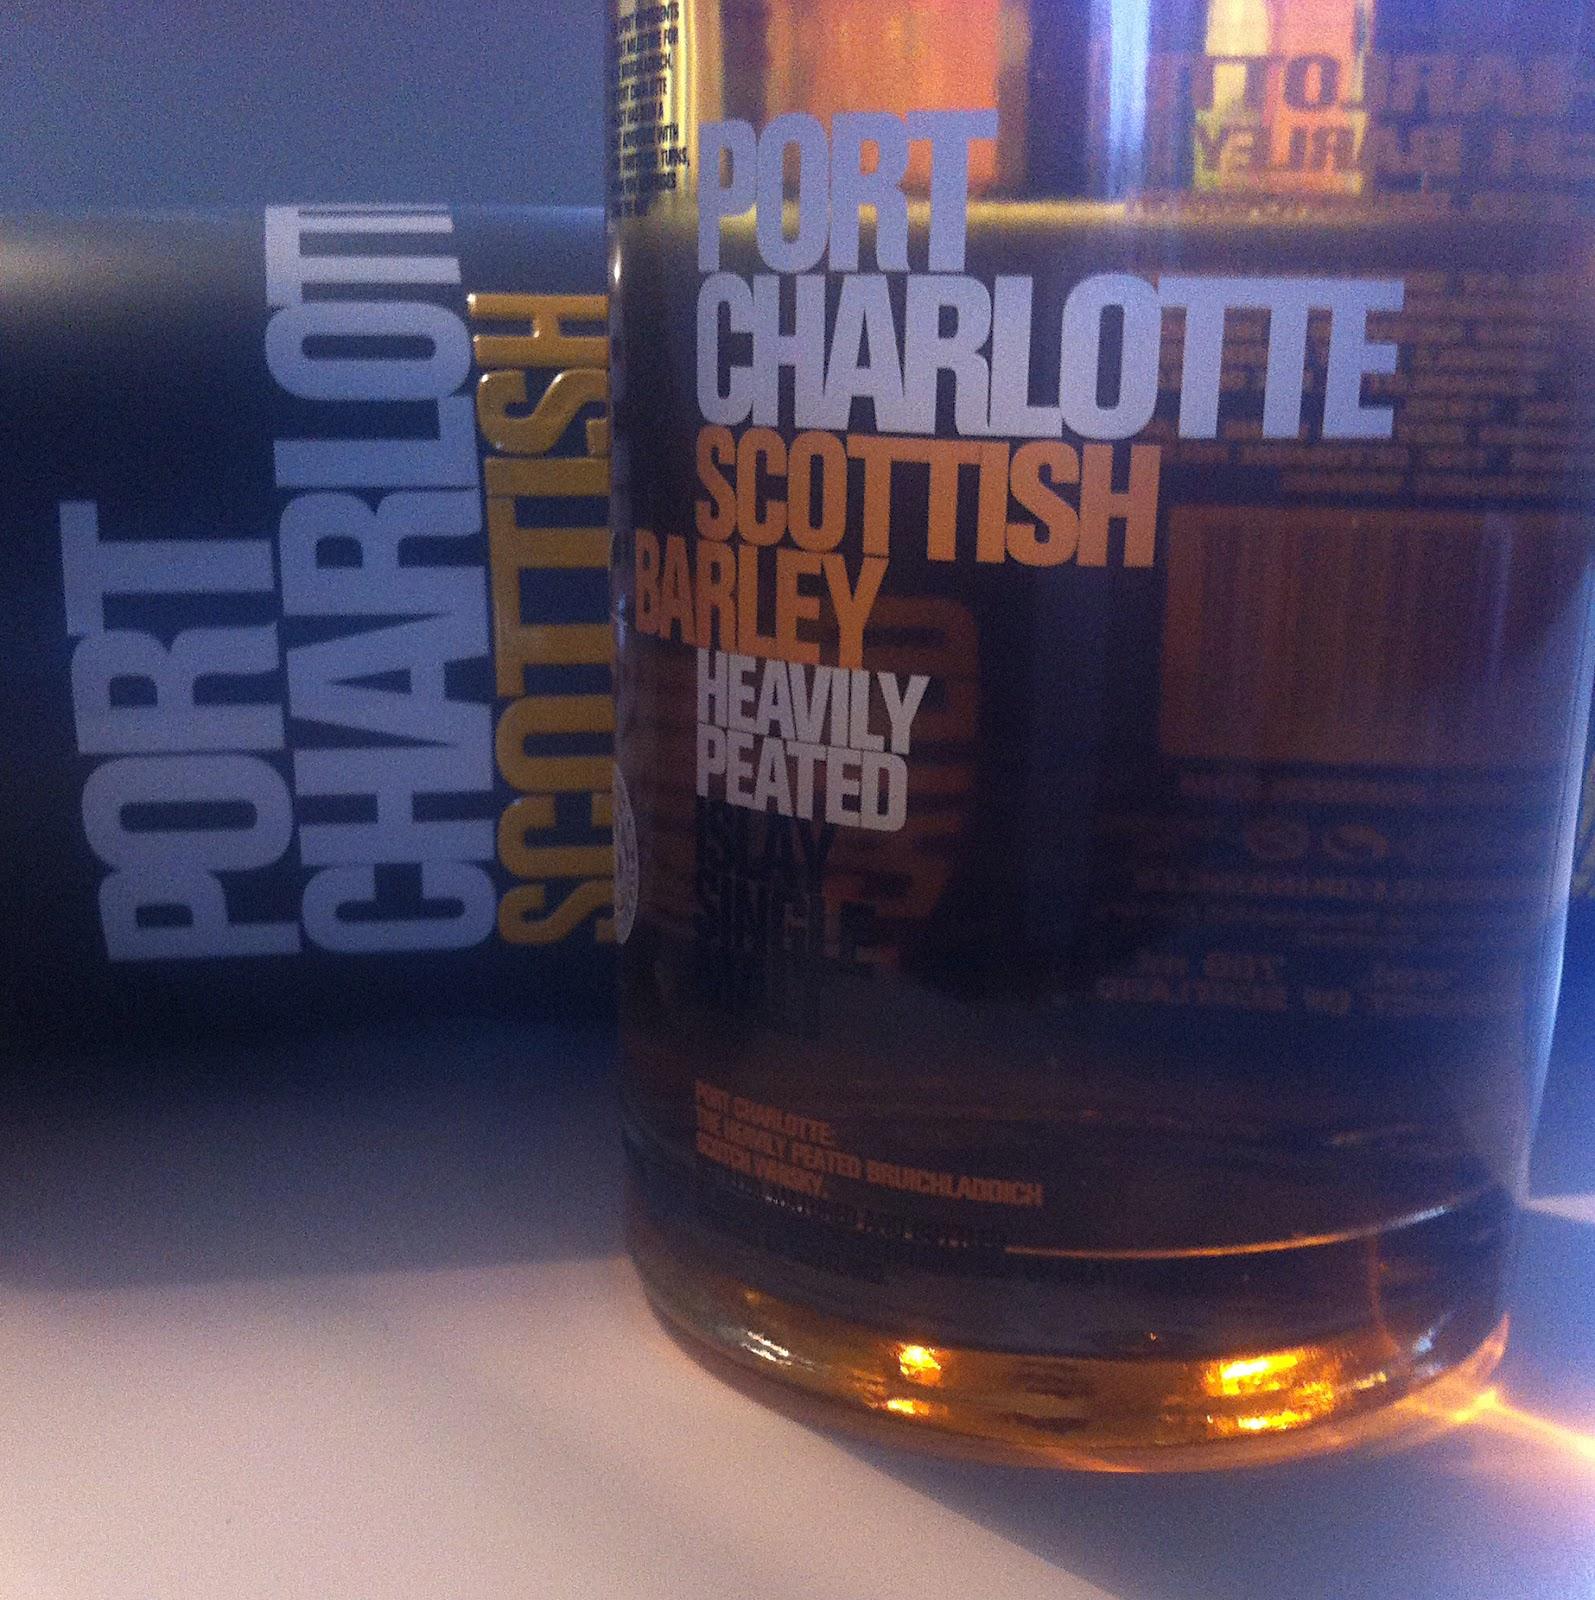 Son of winston churchill whiskey blog tasting - Bruichladdich port charlotte heavily peated ...